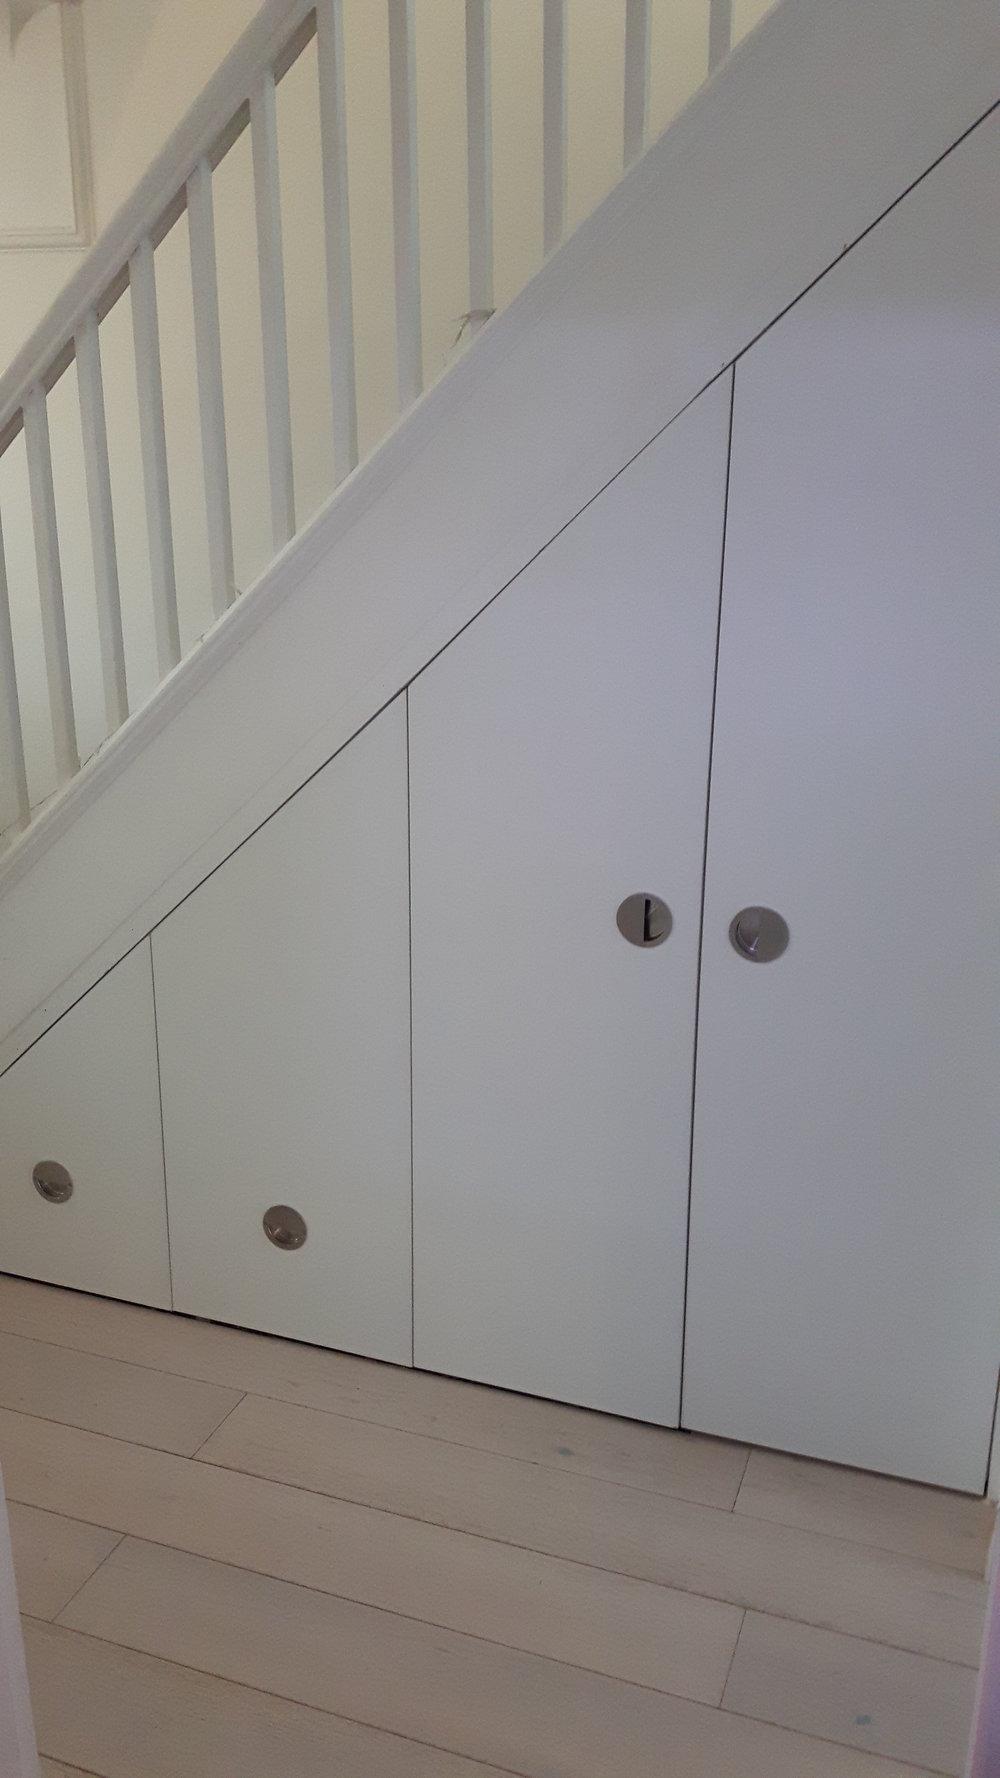 Understair Storage solutions & Under stair storage solutions \u2014 Home Projects